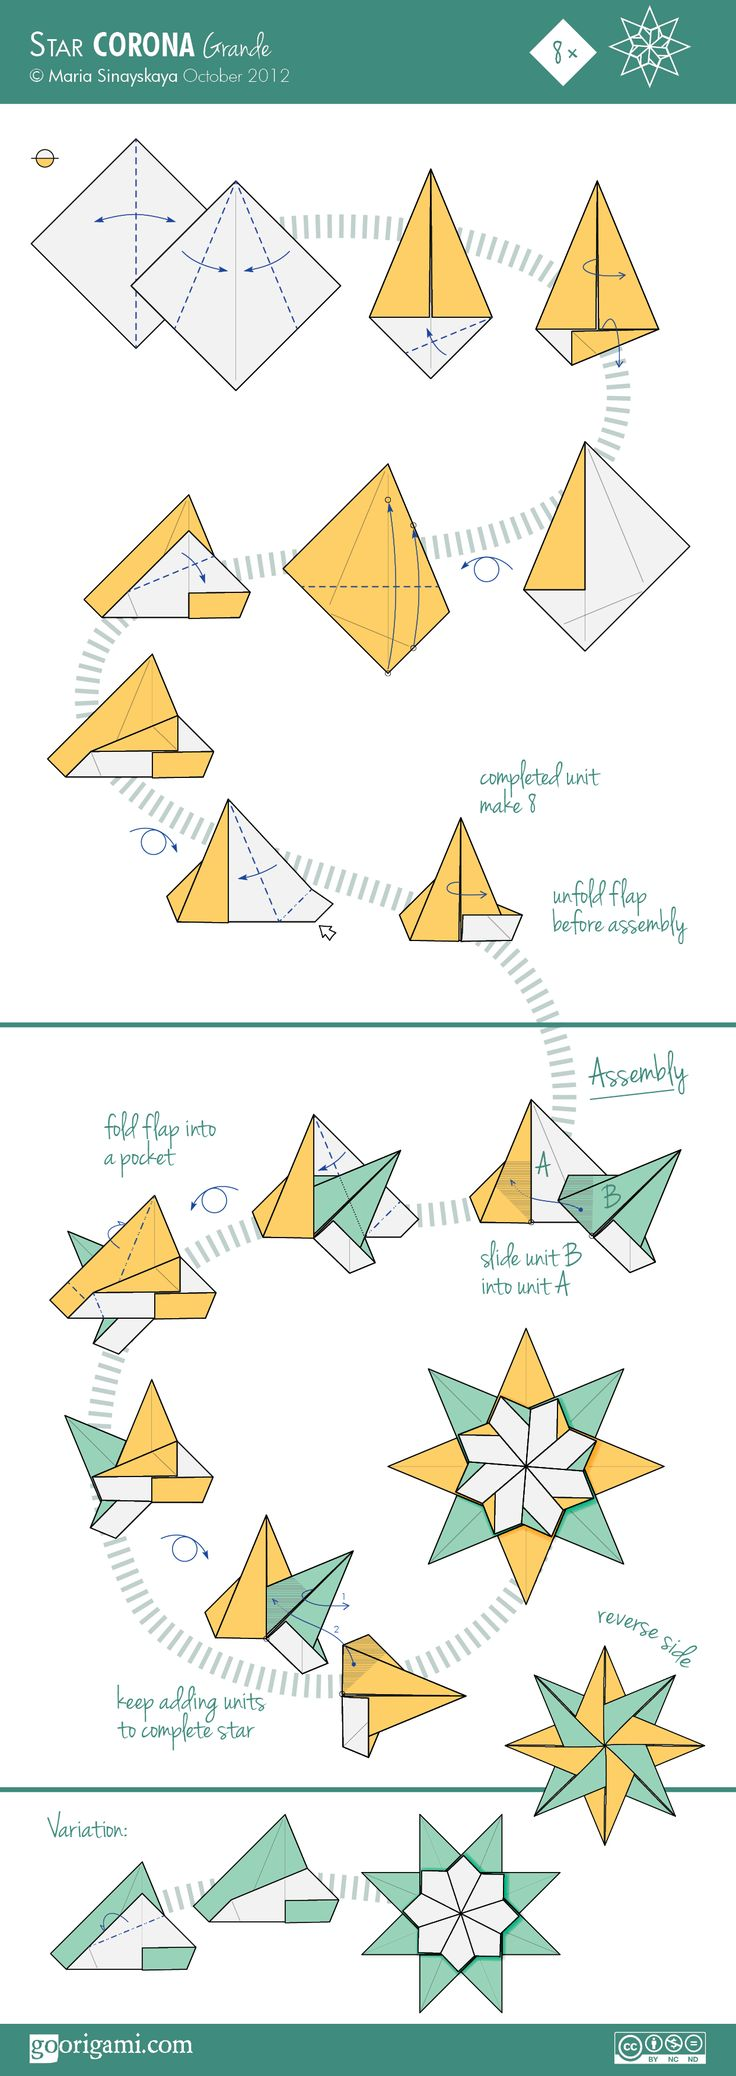 Star Corona Grande Diagram. Easy to follow origami star directions.